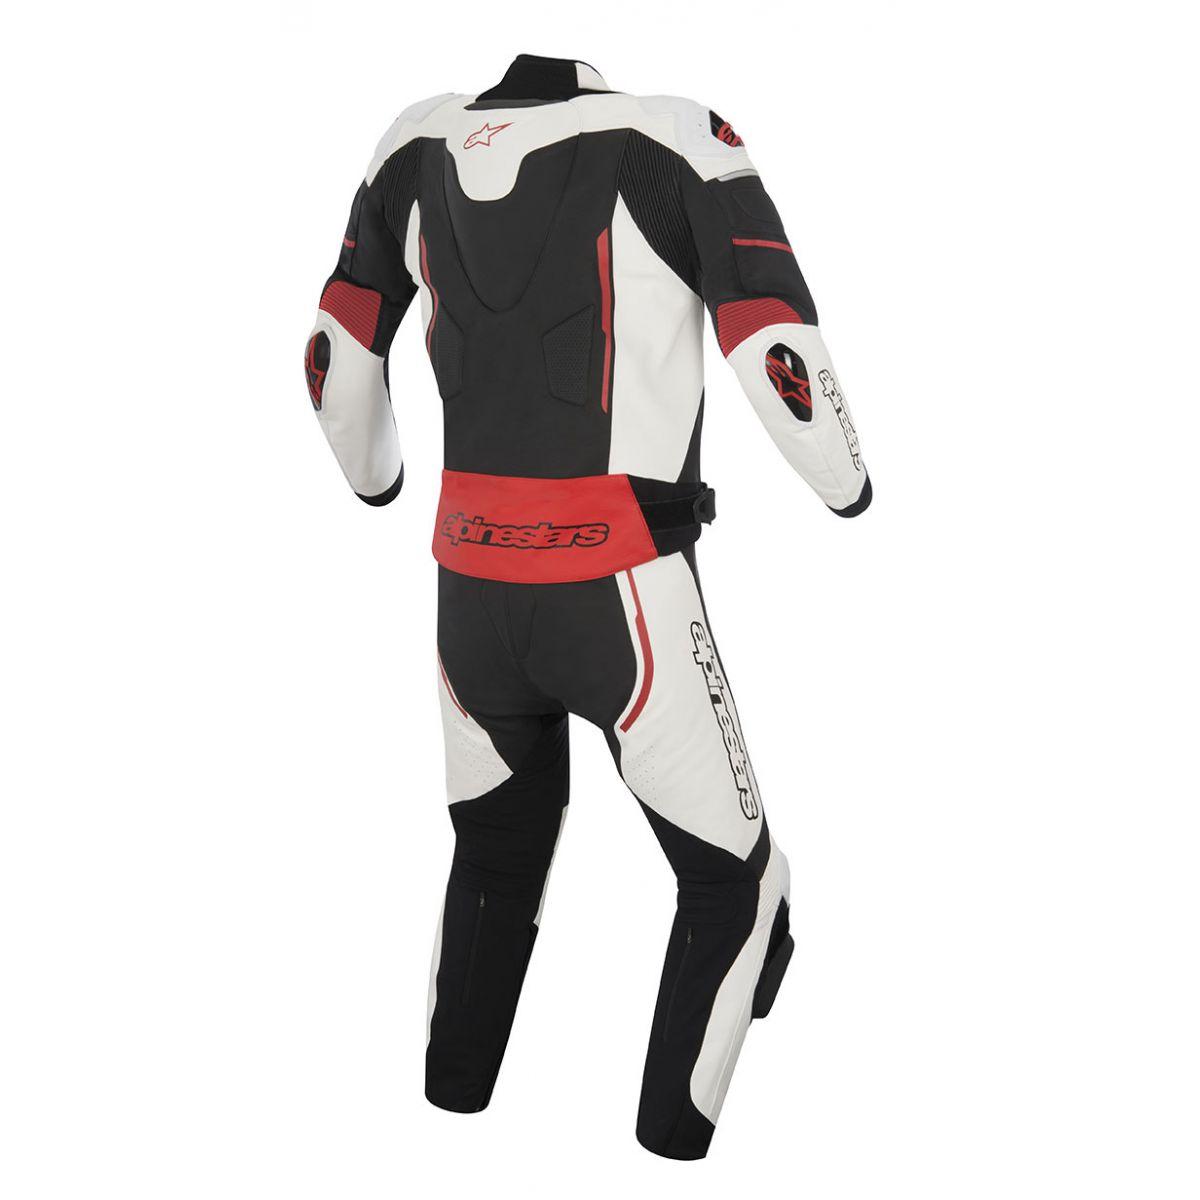 Macacão Alpinestars Atem Preto/Branco/Vermelho - 2 peças  - Super Bike - Loja Oficial Alpinestars